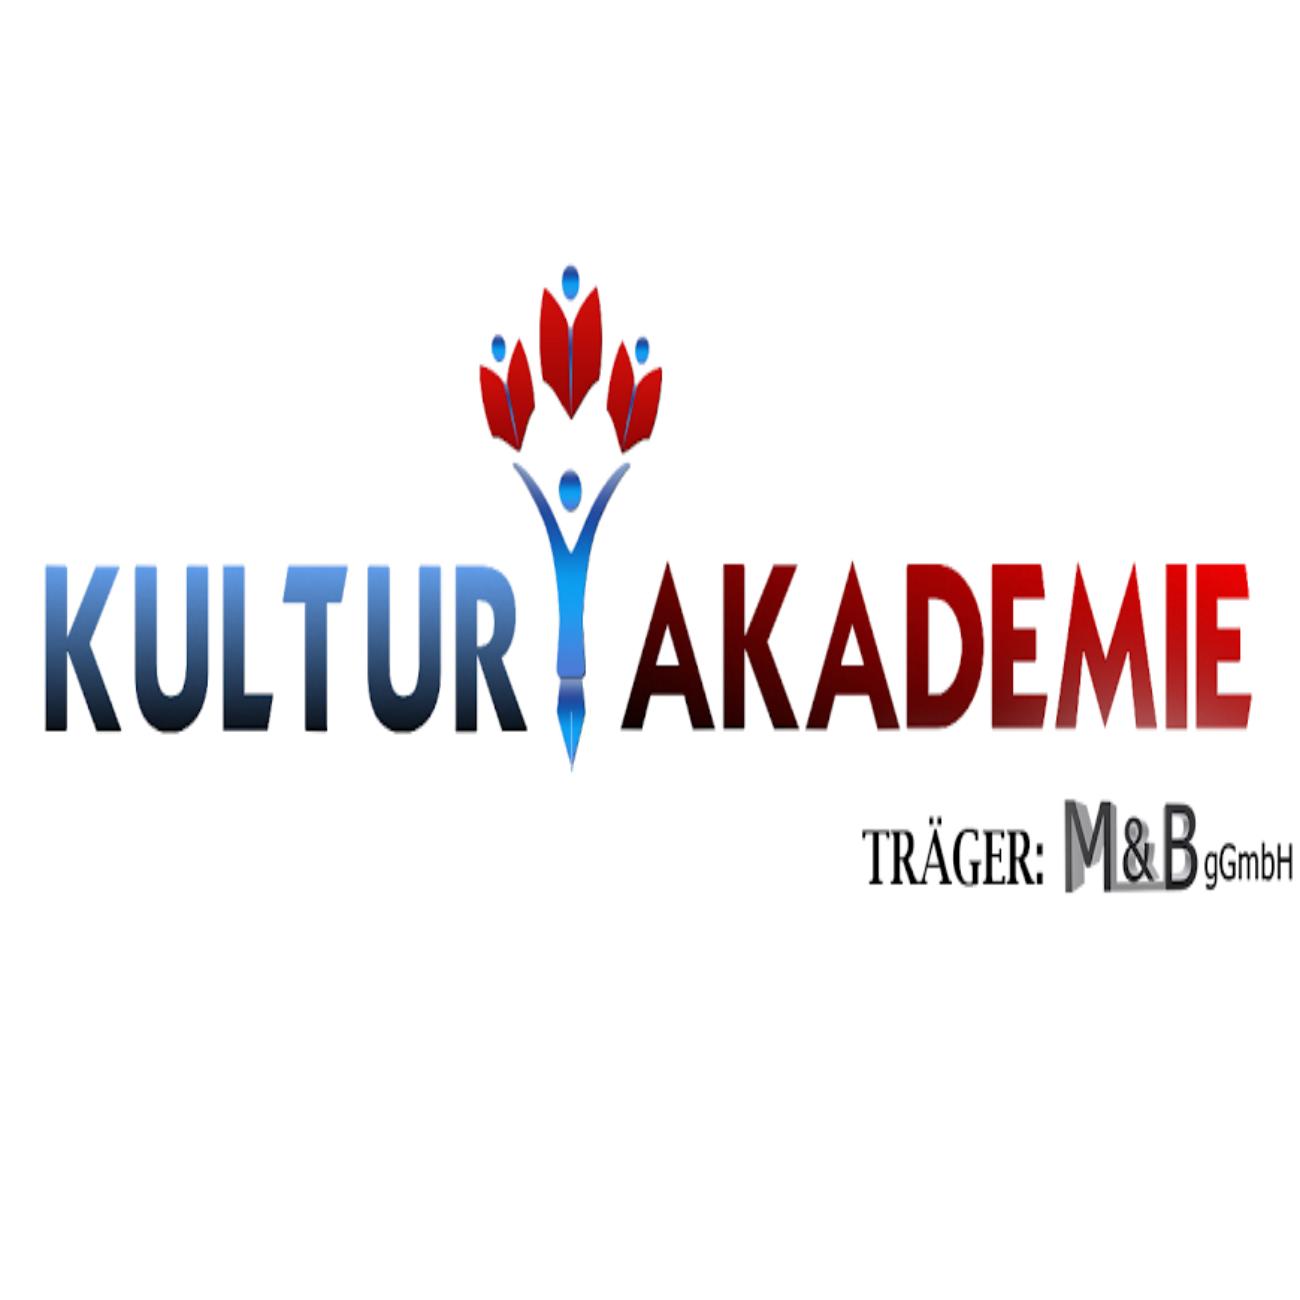 KulturAkademie